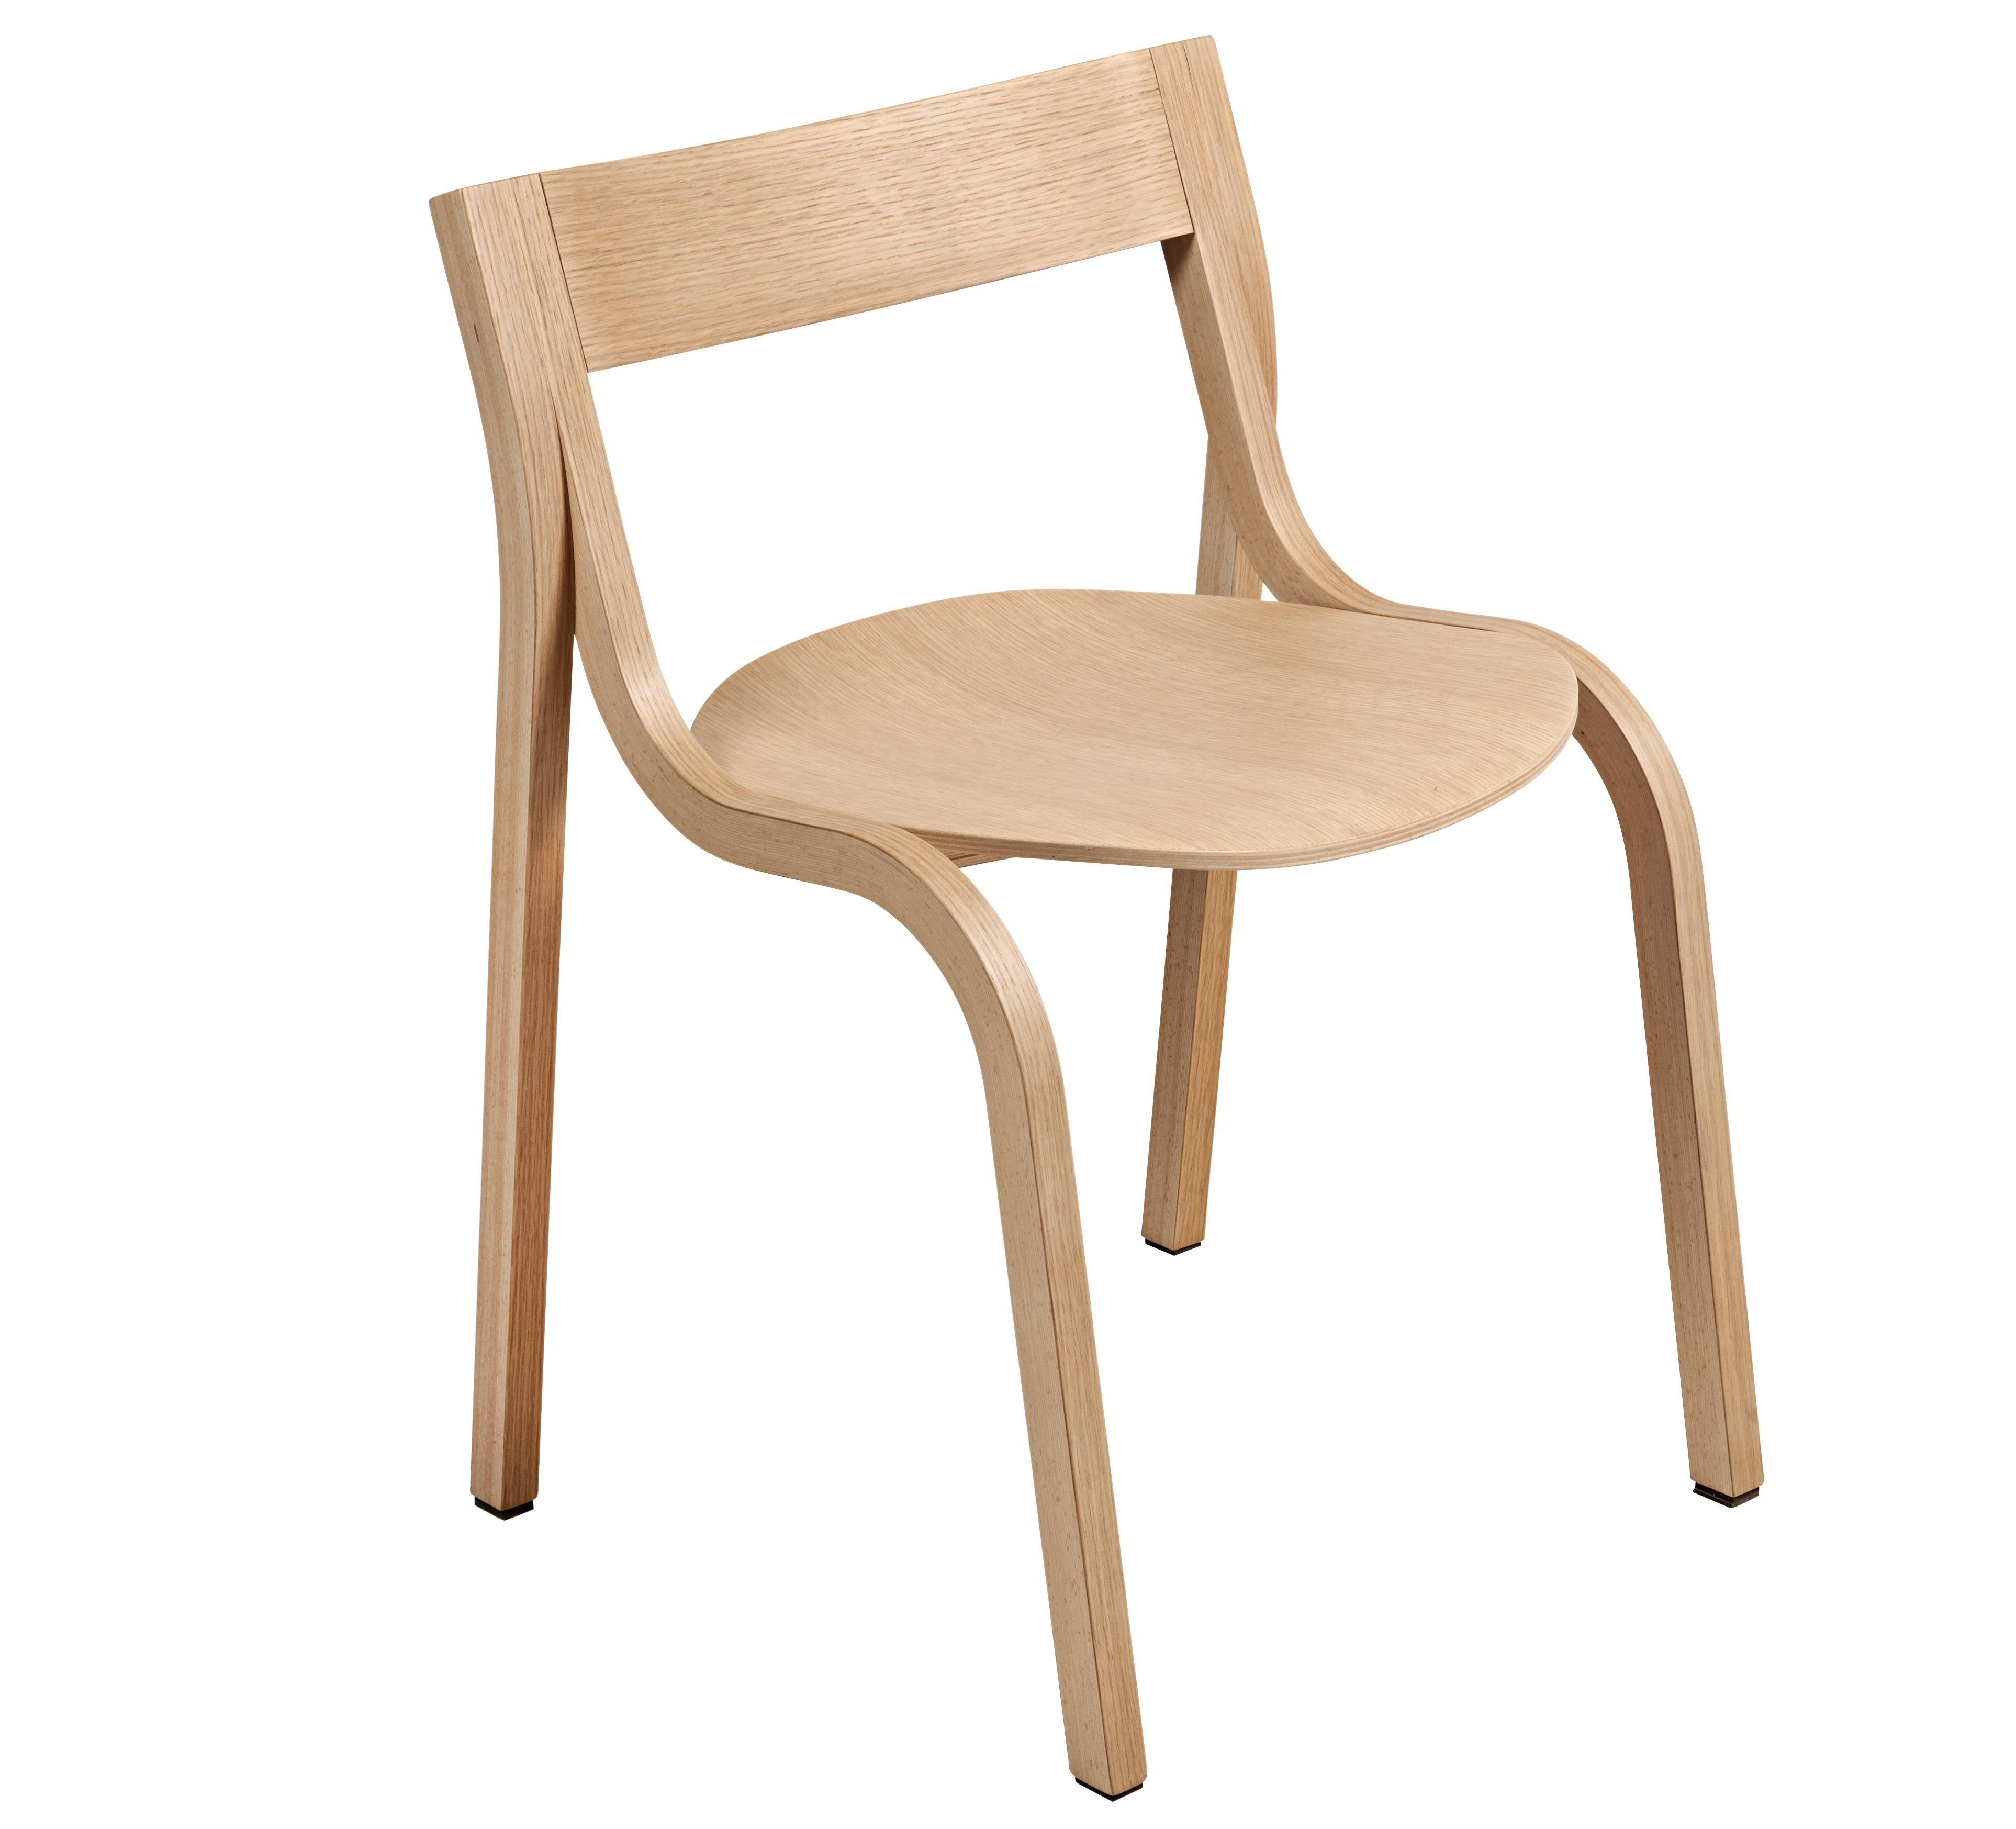 Chaise empilable konrad bois naturel ch ne blanchi lapalma for Chaise empilable